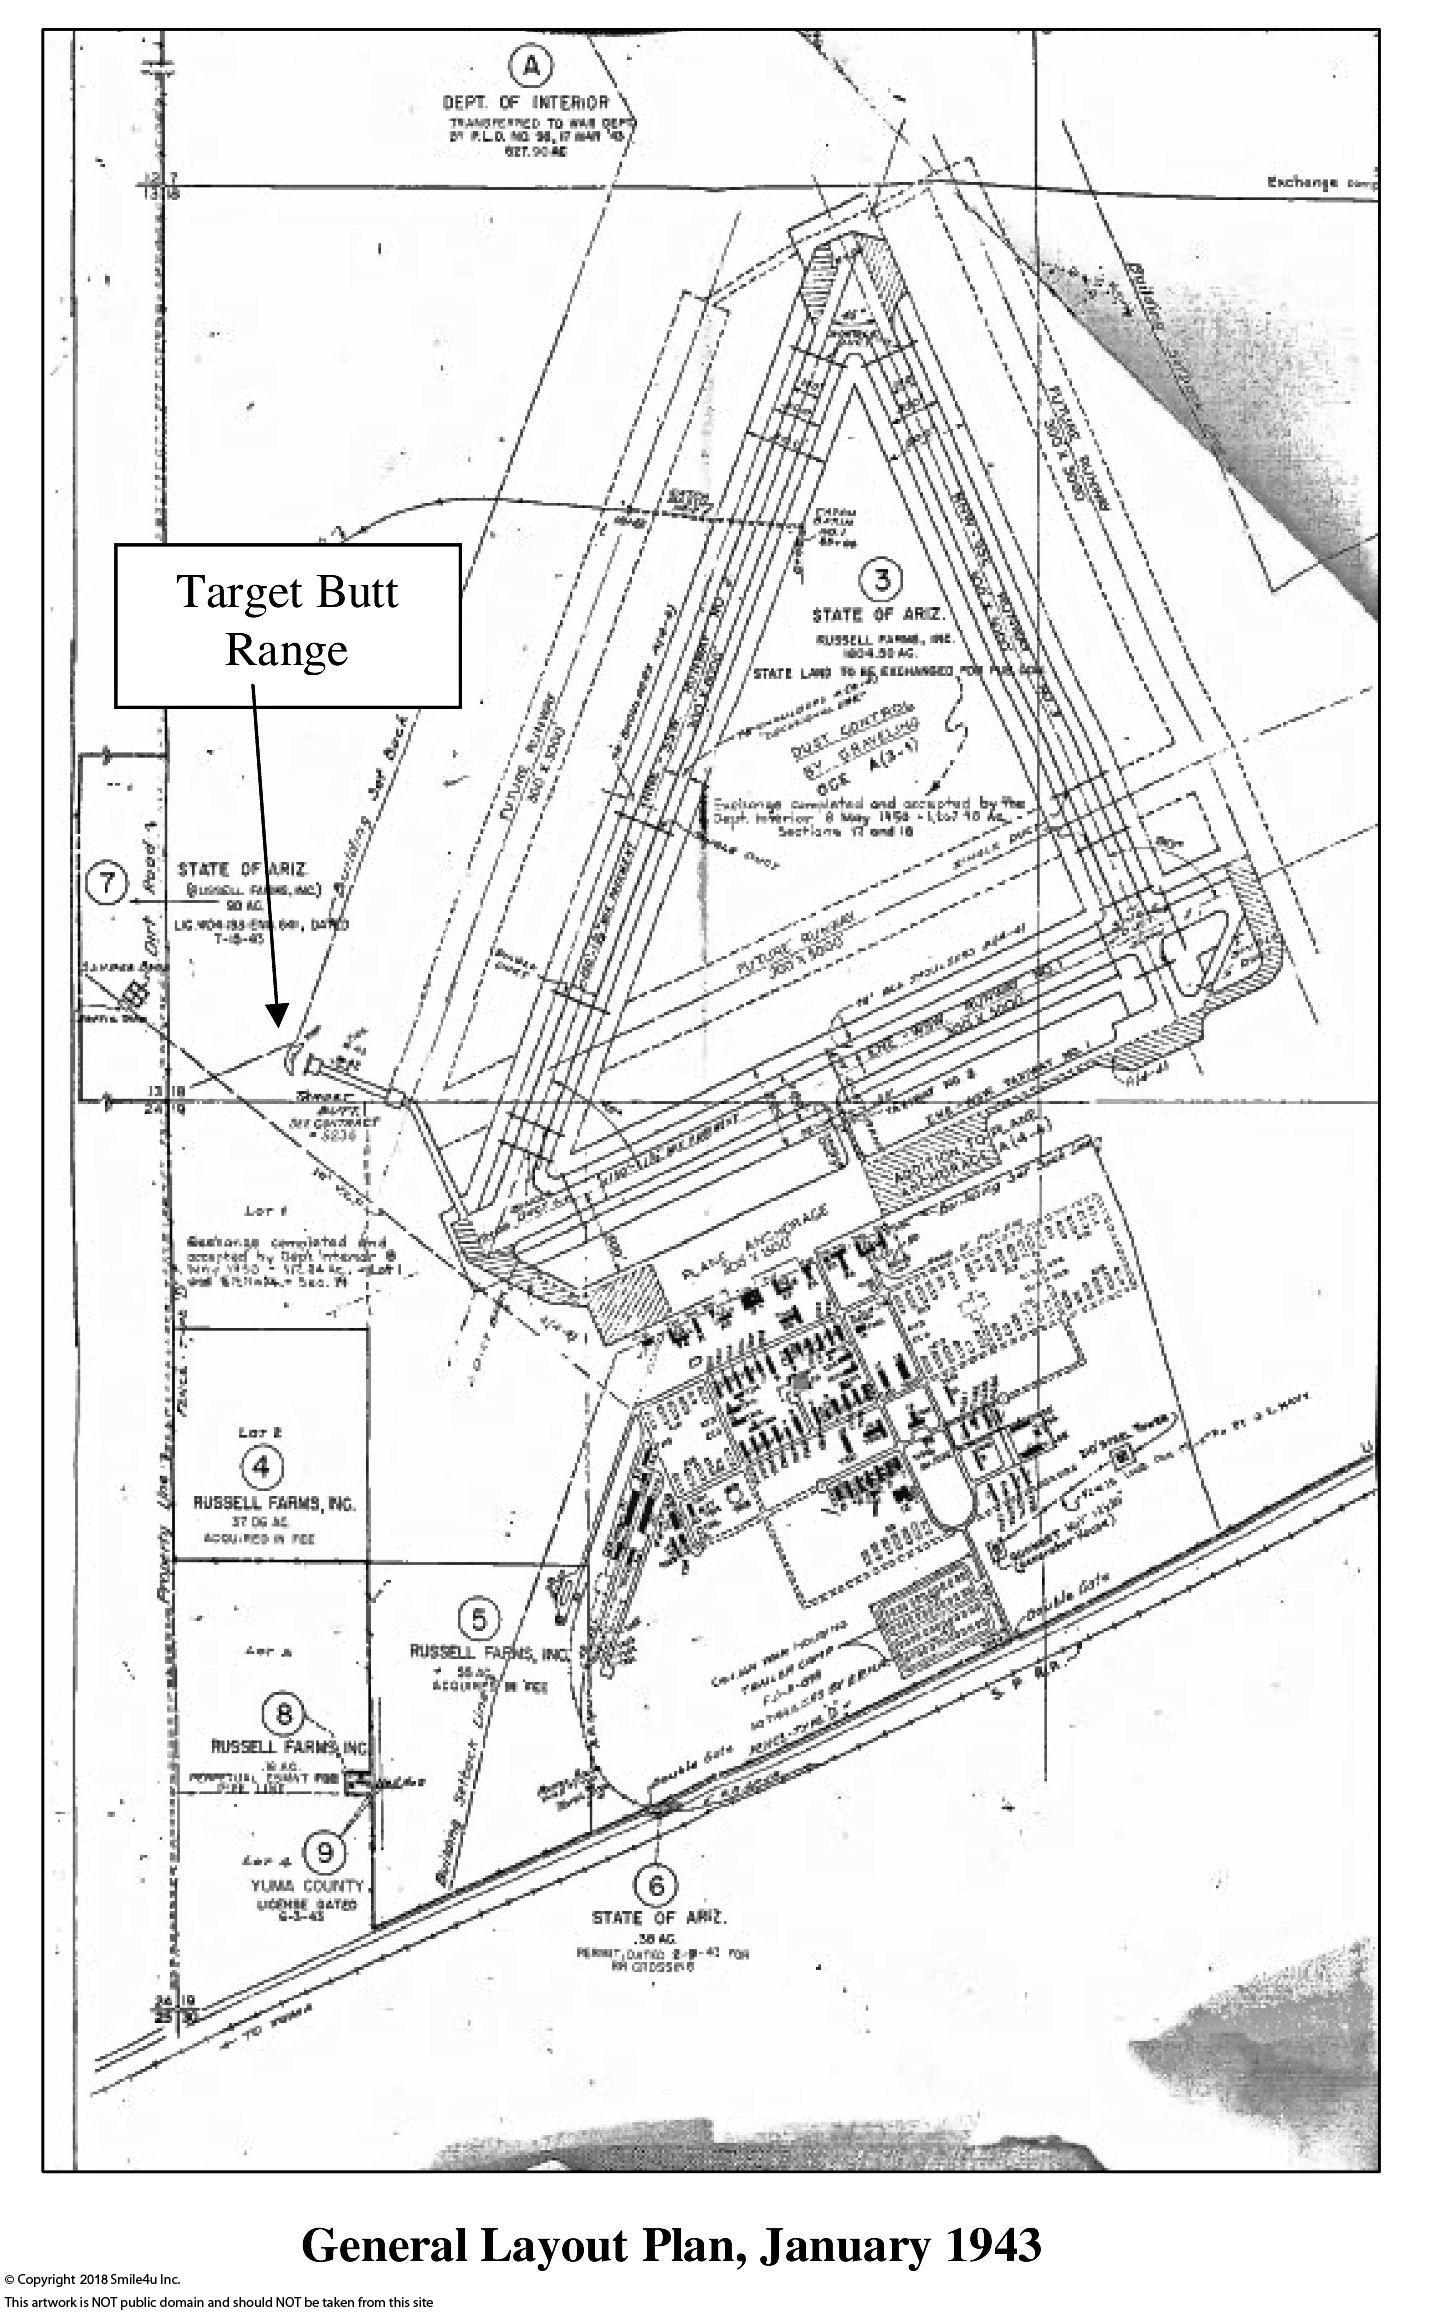 480357_watermarked_Dateland_AAF_general_layout_plan_jan_1943.jpg